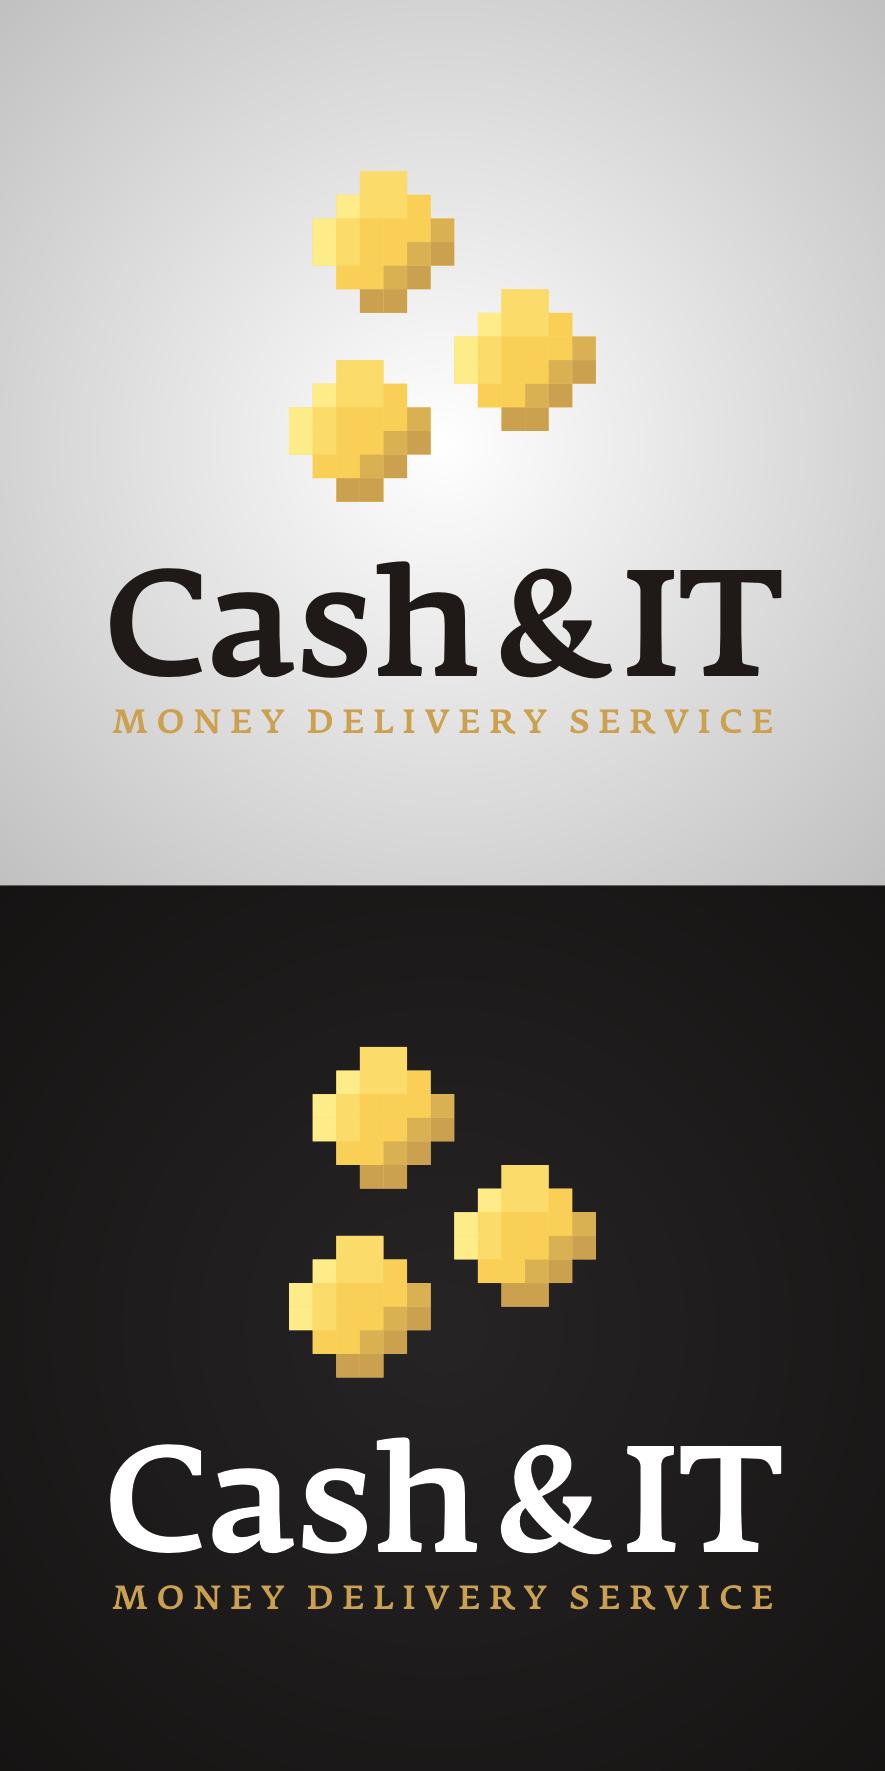 Логотип для Cash & IT - сервис доставки денег фото f_8515fdba6224d28f.png